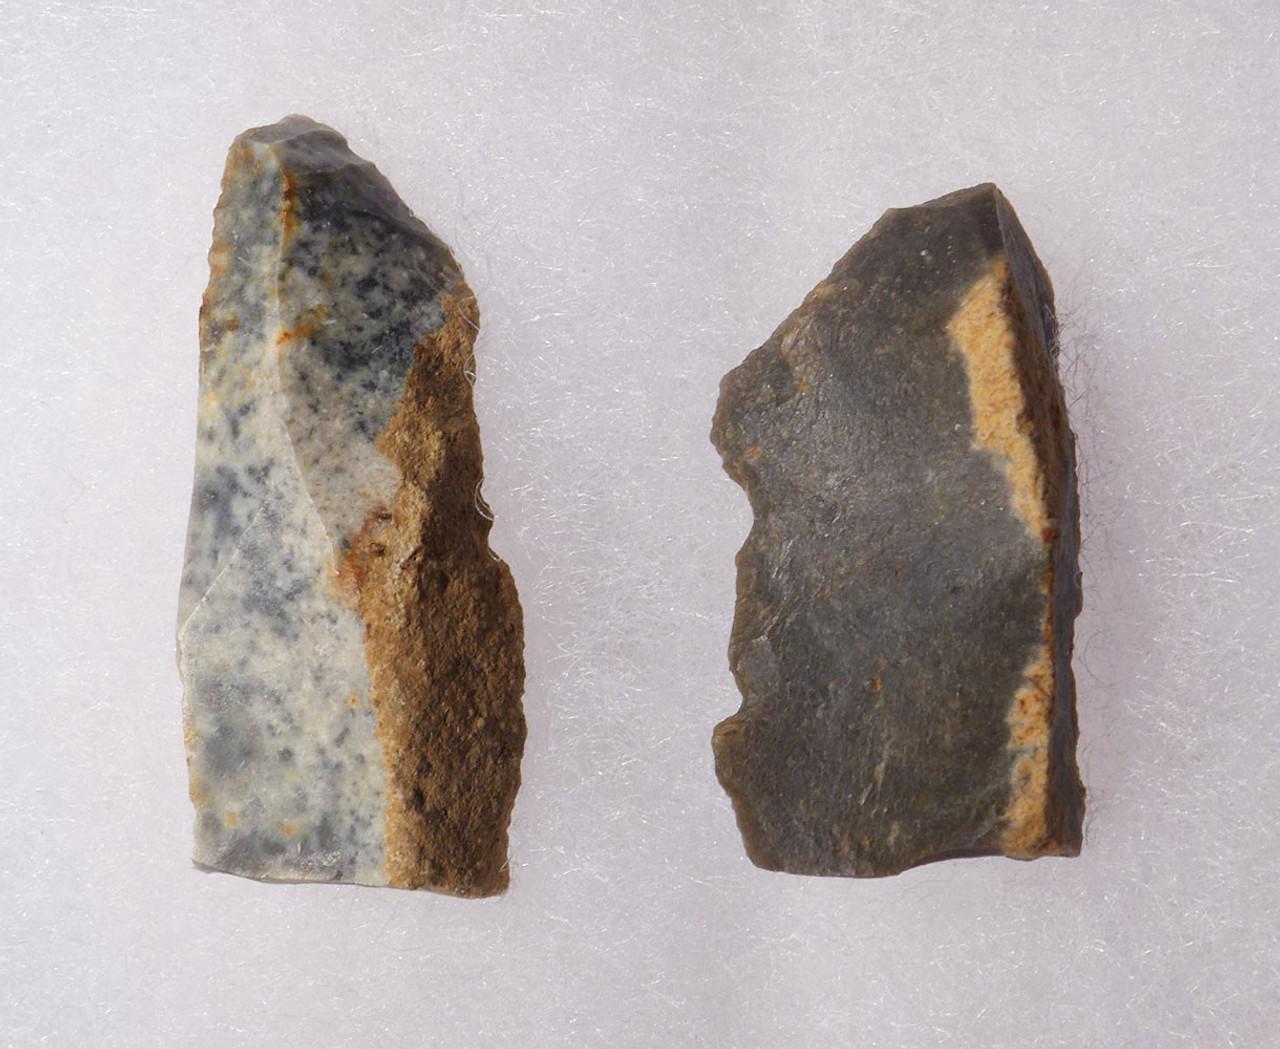 TWO SMALL UPPER PALEOLITHIC STONE KNIVES FROM FAMOUS AURIGNACIAN CRO-MAGNON SITE LA ROCHETTE FRANCE  *UP043